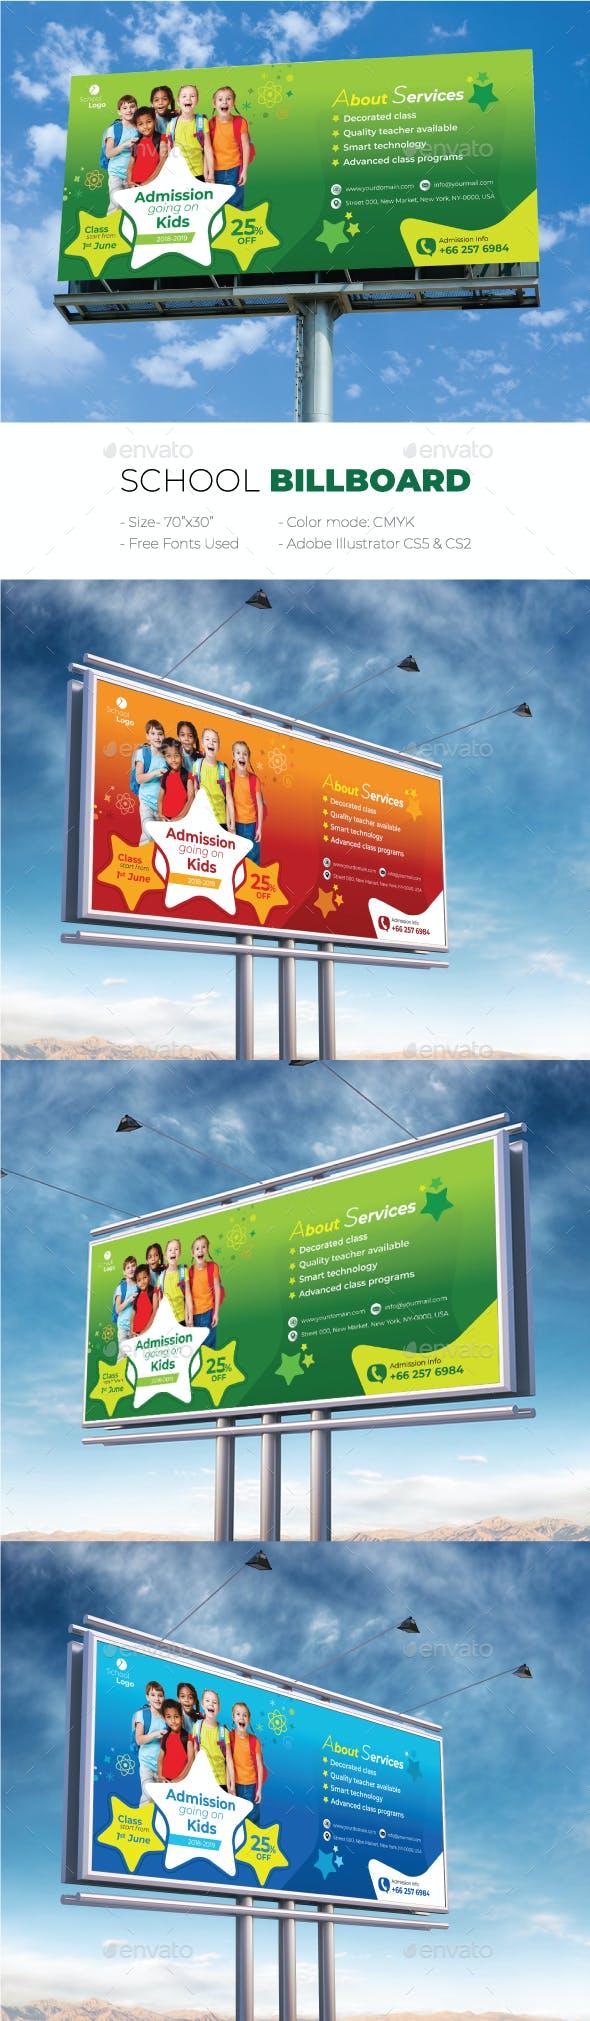 School Billboard